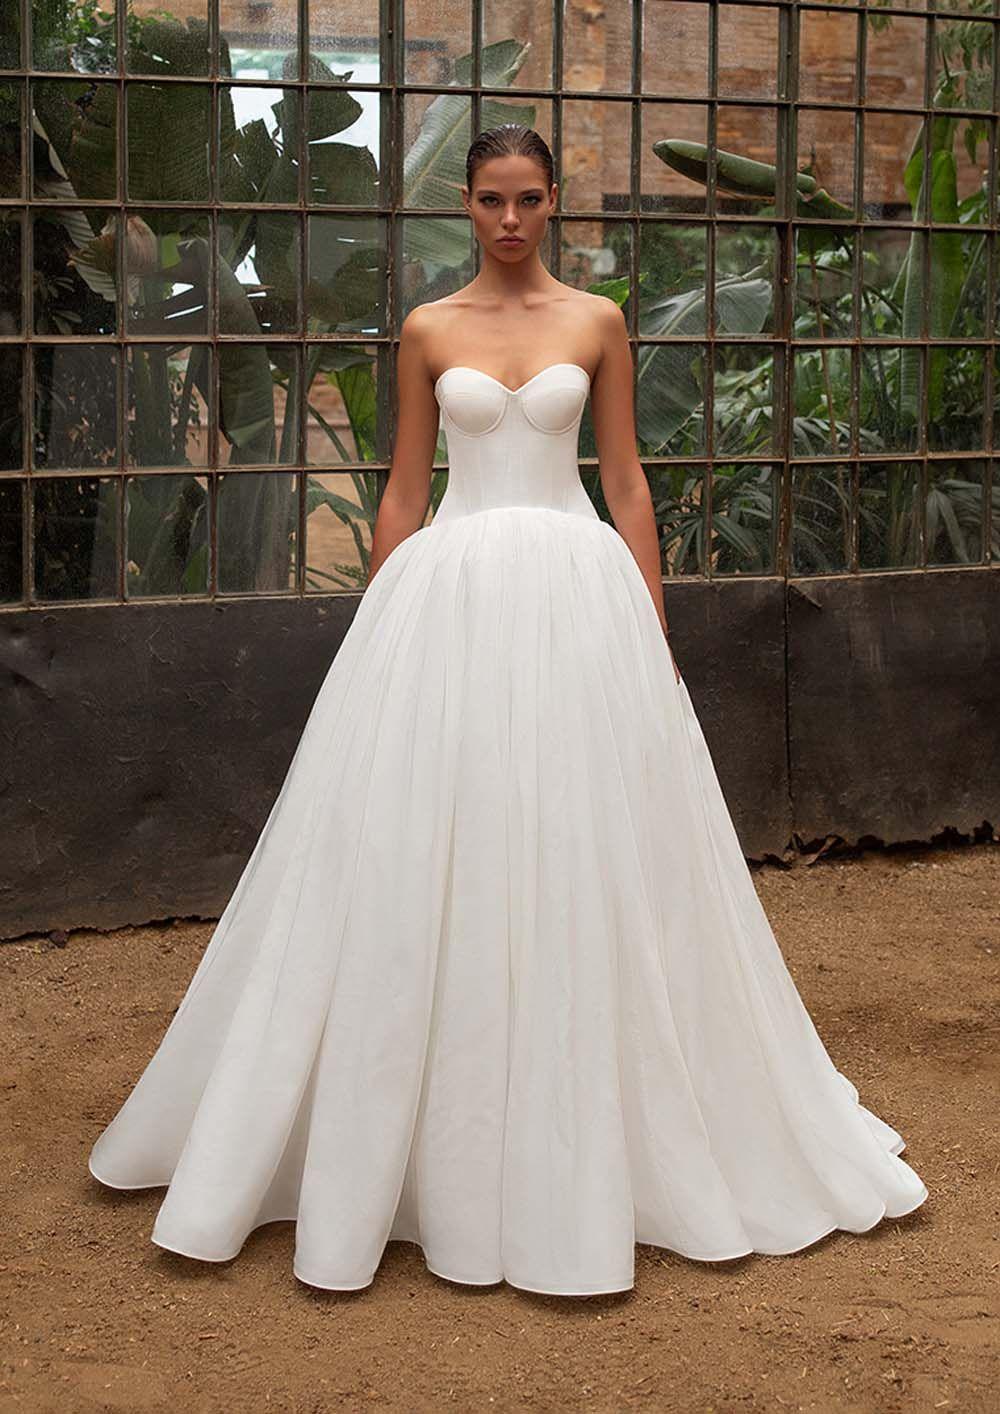 Zac Posen For White One Fall 2020 Wedding Dresses Weddingbells Wedding Dresses Simple Fall Wedding Dresses Wedding Dresses [ 1414 x 1000 Pixel ]